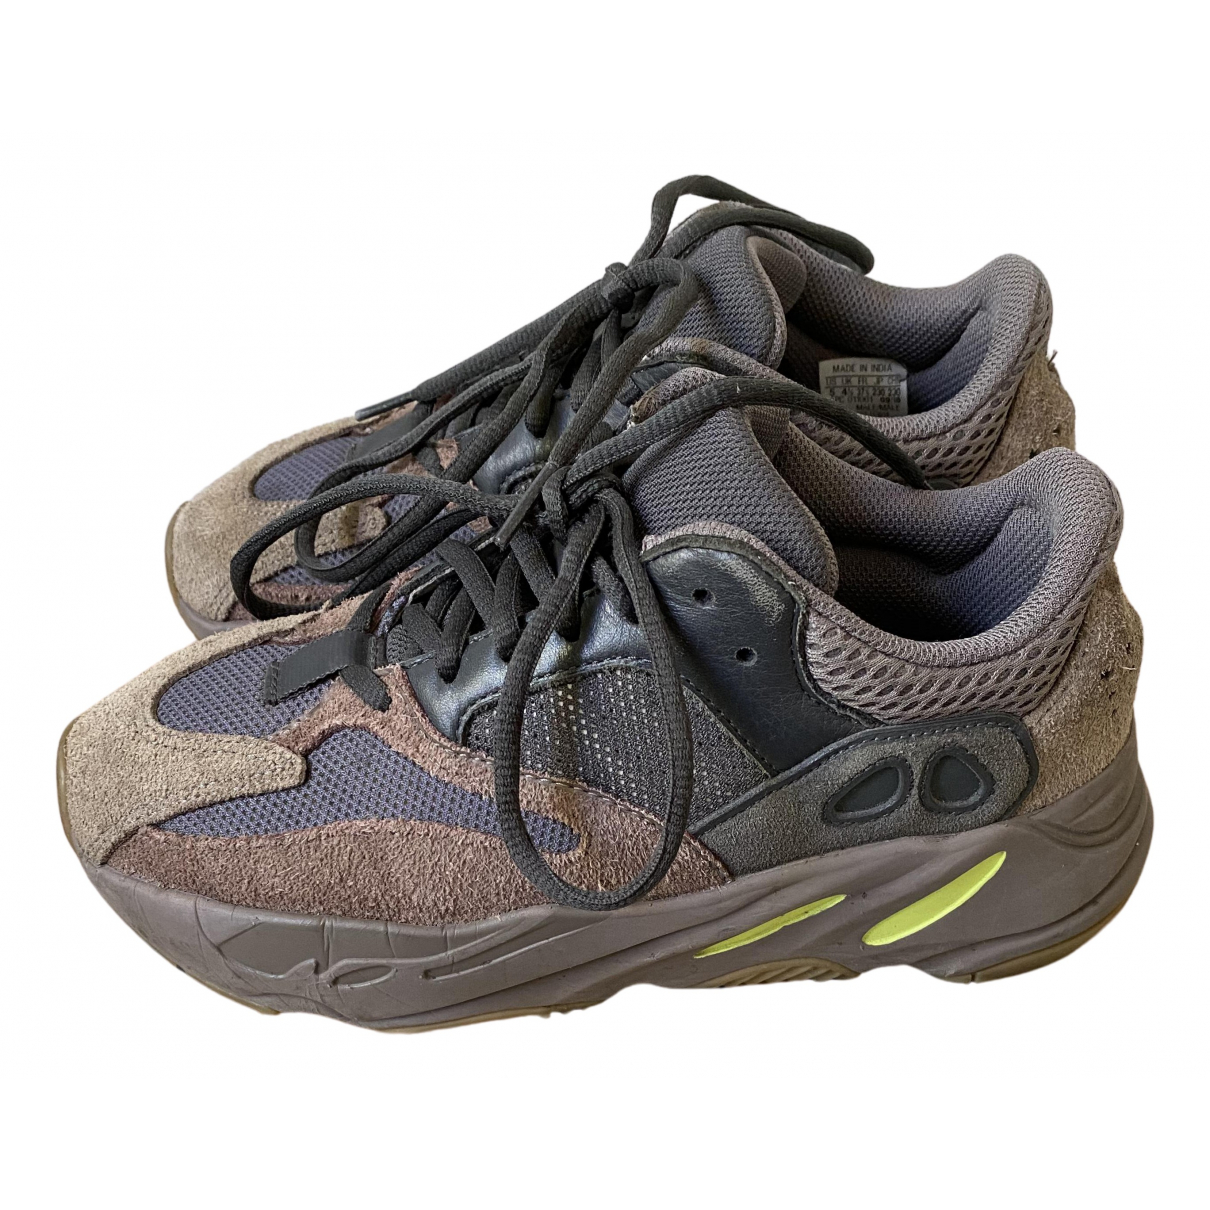 Yeezy X Adidas - Baskets Boost 700 V1  pour femme en suede - kaki